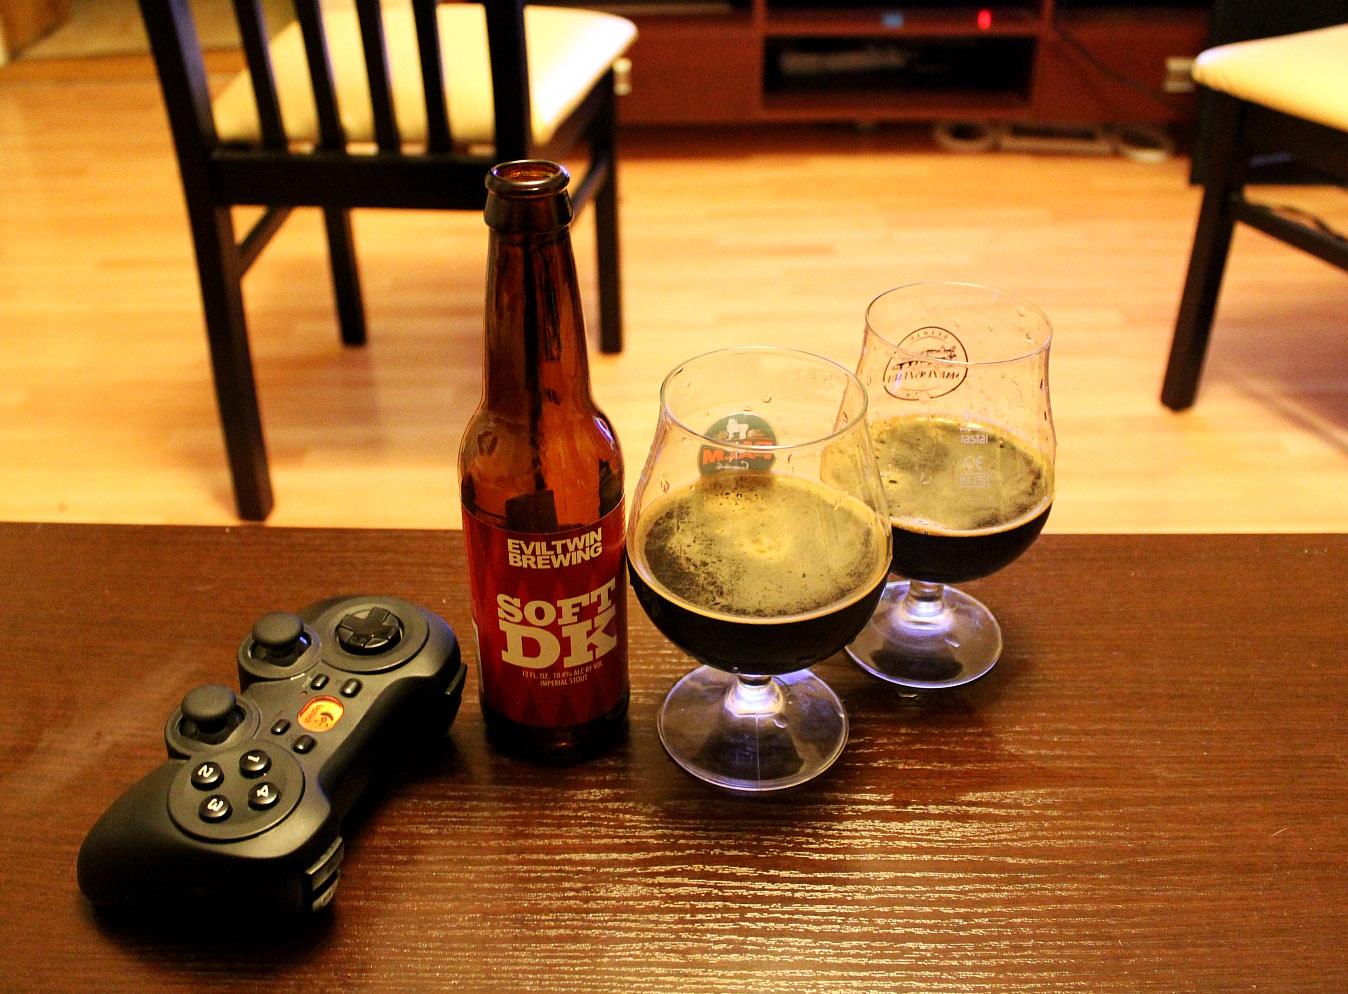 eviltwin-brewing-soft-dk-glass